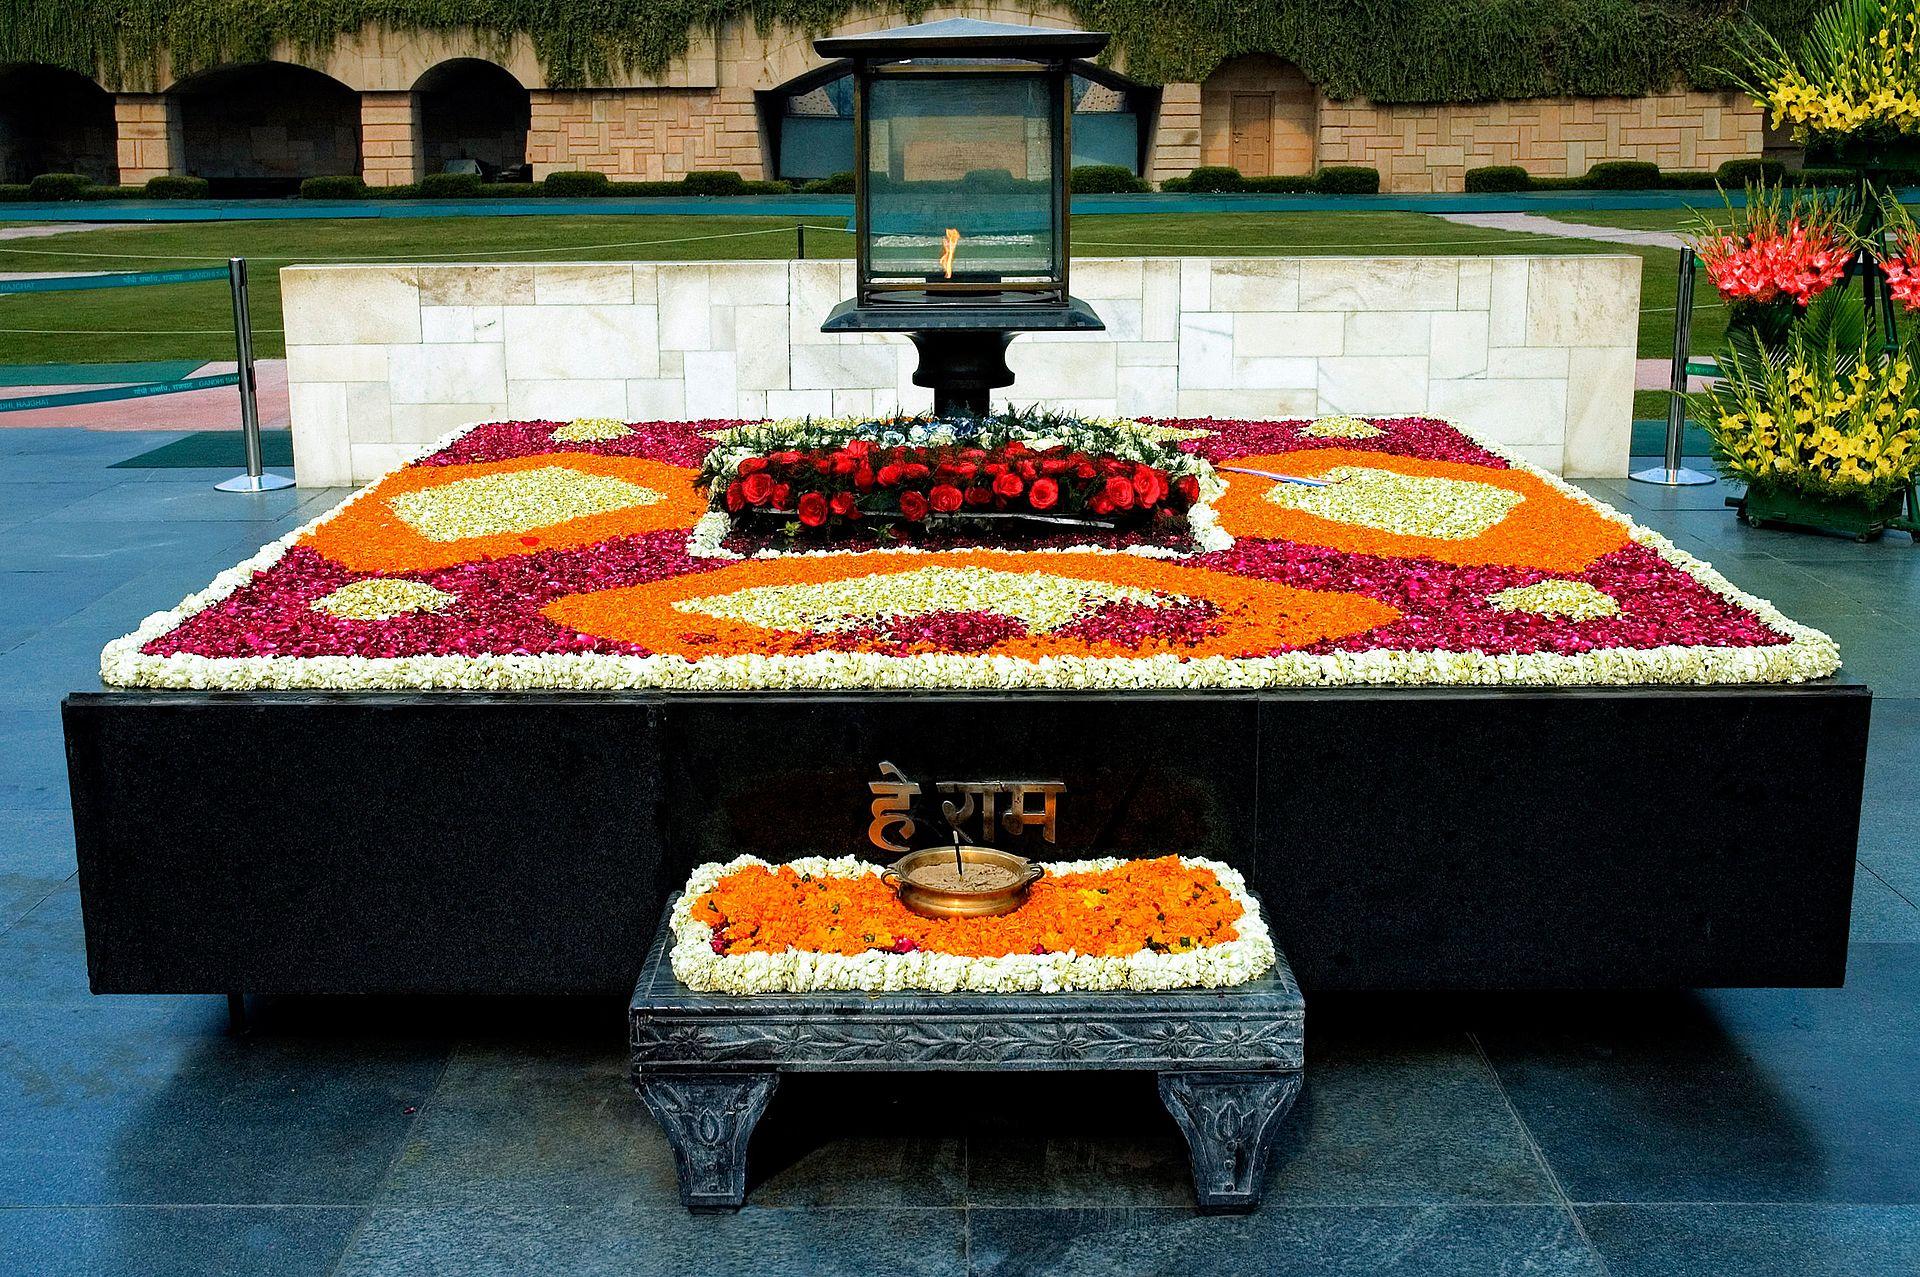 50+ Free Gandhi & India Images - Pixabay